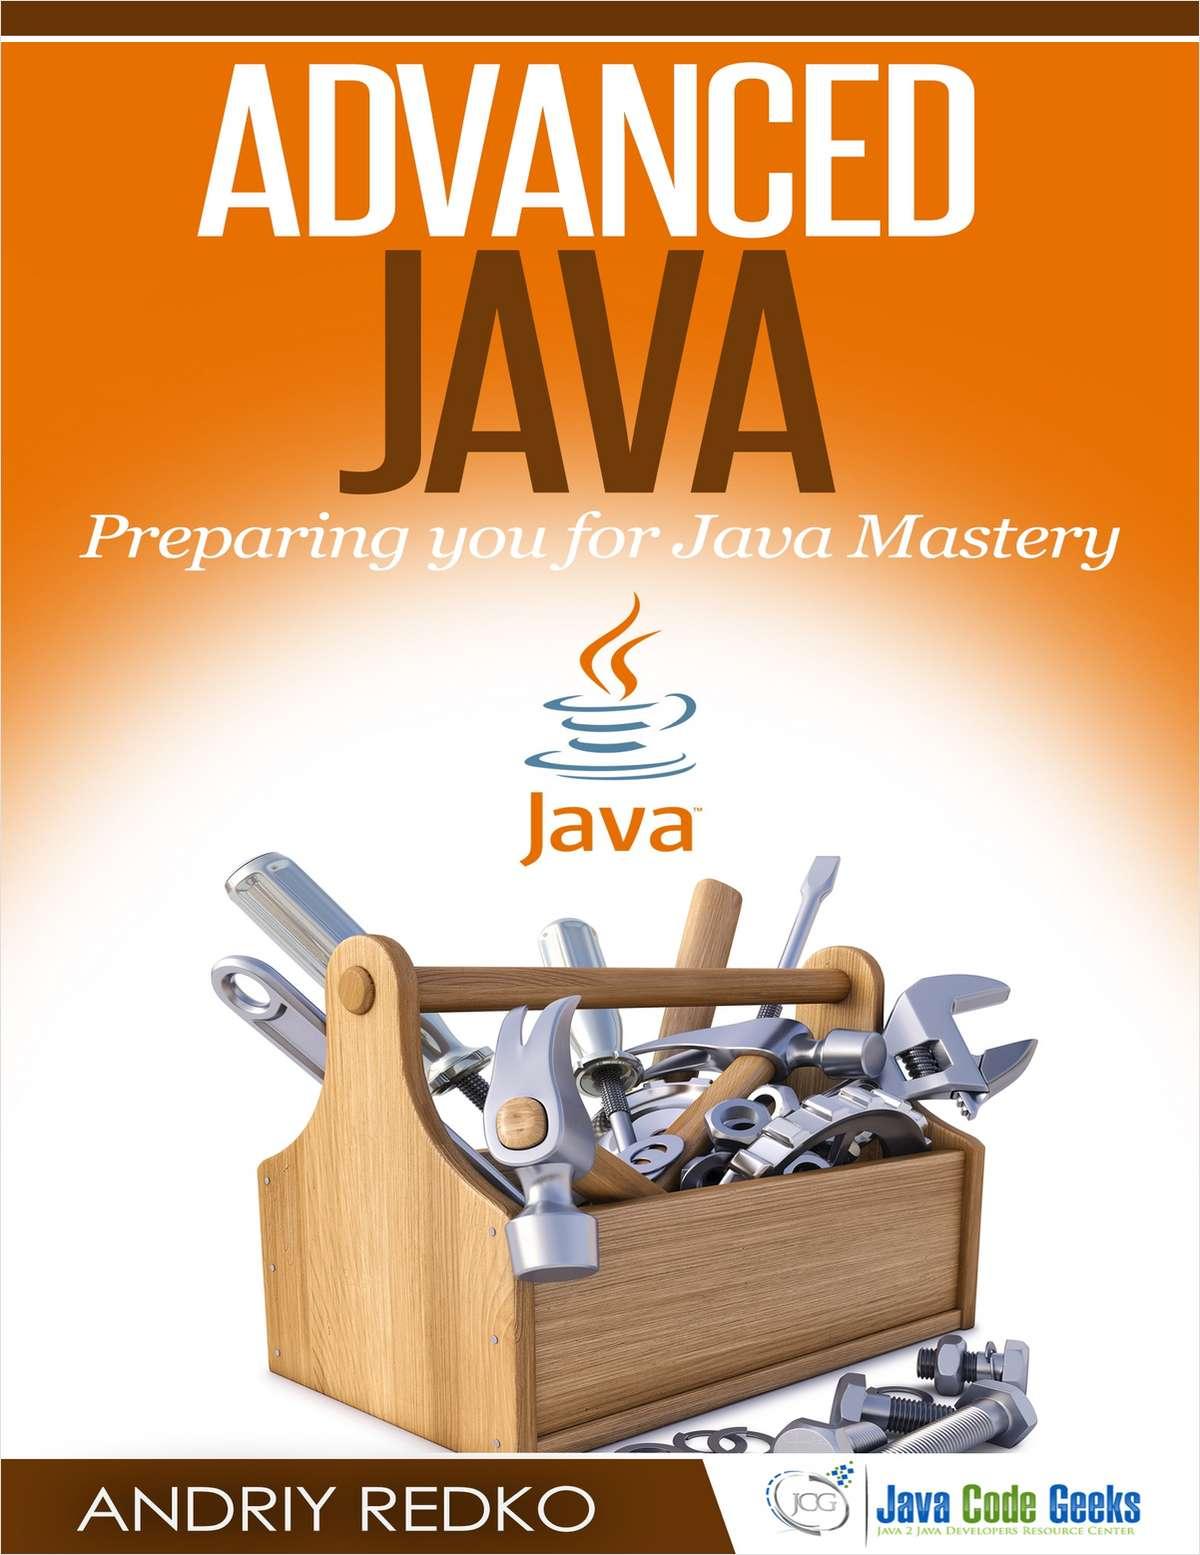 Dev Tips - Advanced Java Tutorial - GISuser.com